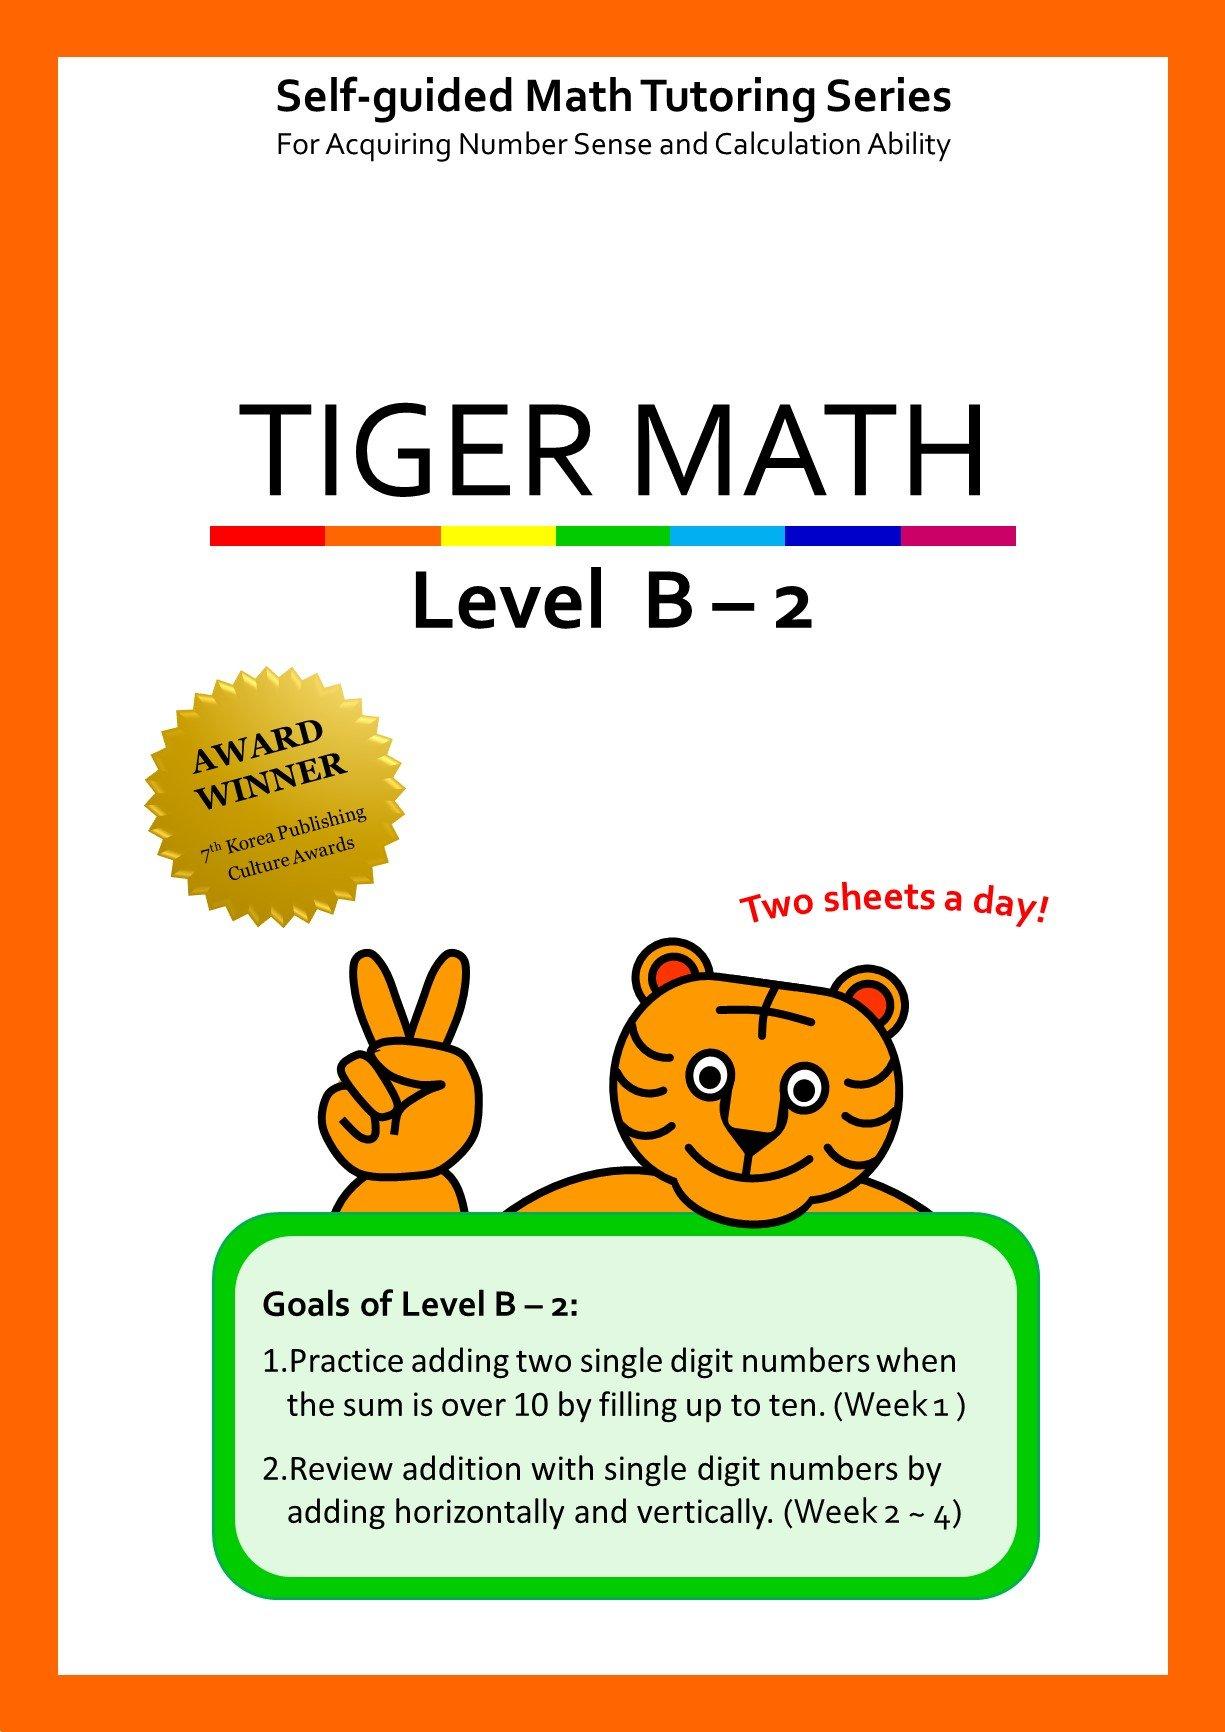 Read Online Tiger Math Level B - 2 for Grade 1 (Self-guided Math Tutoring Series - Elementary Math Workbook) pdf